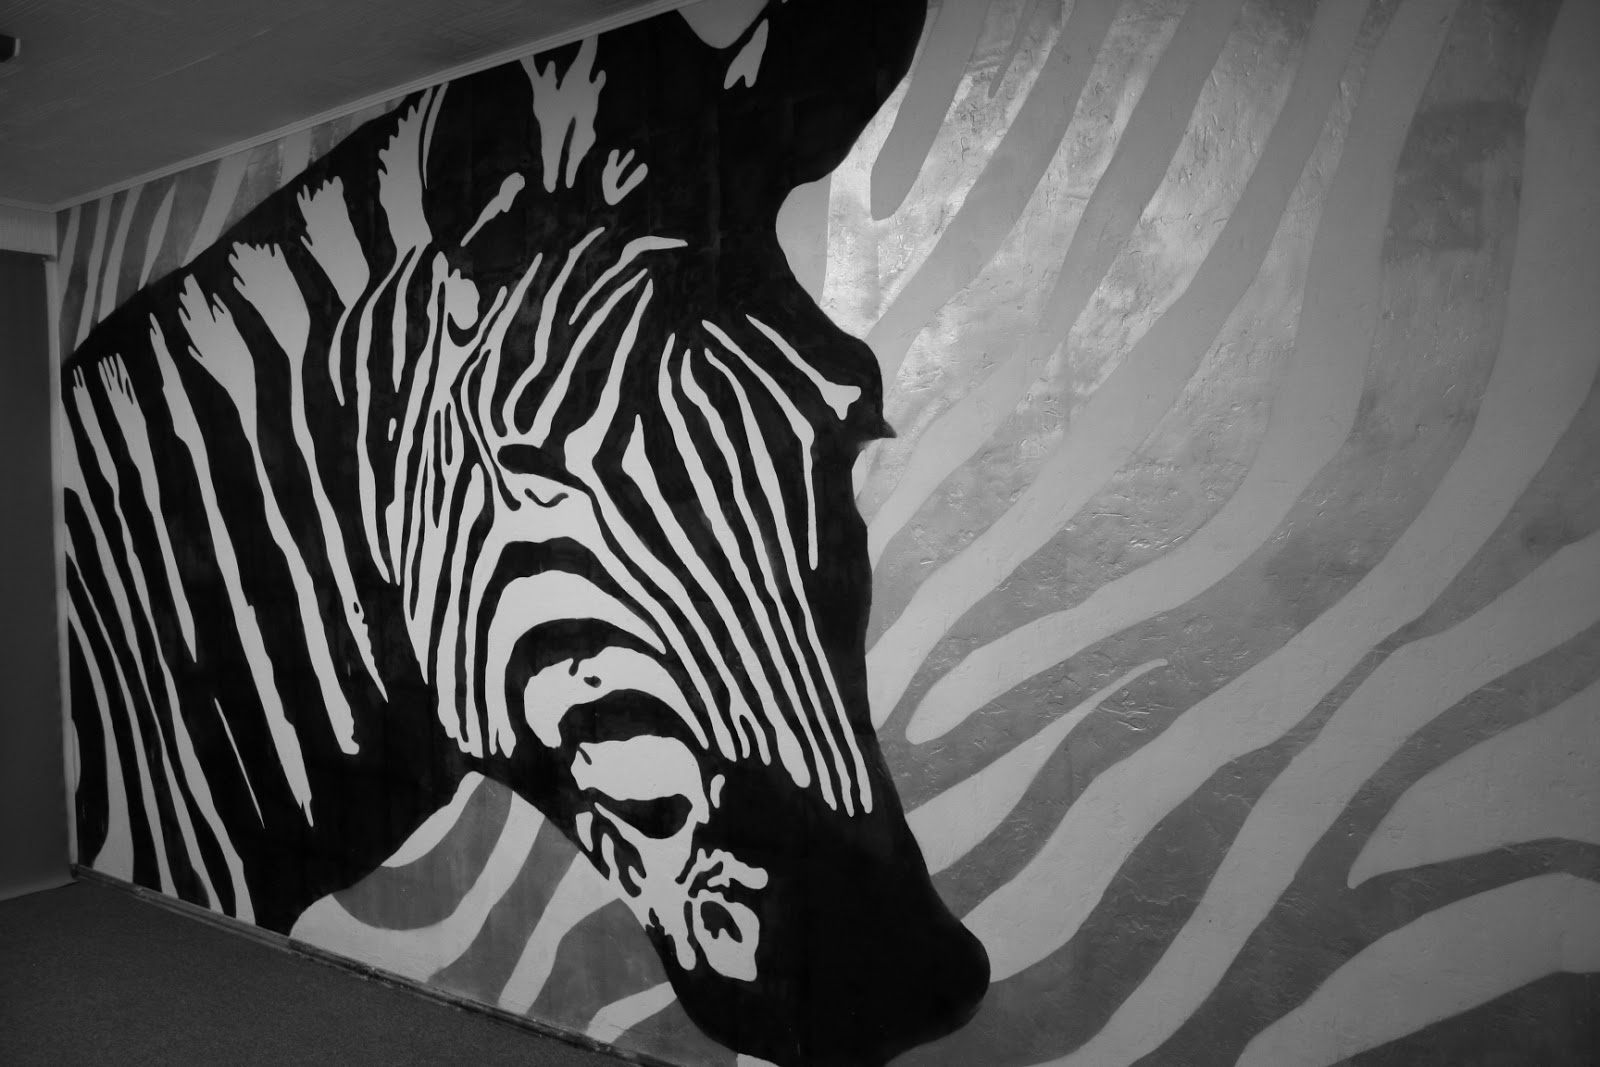 Рисунок зебры в интерьере